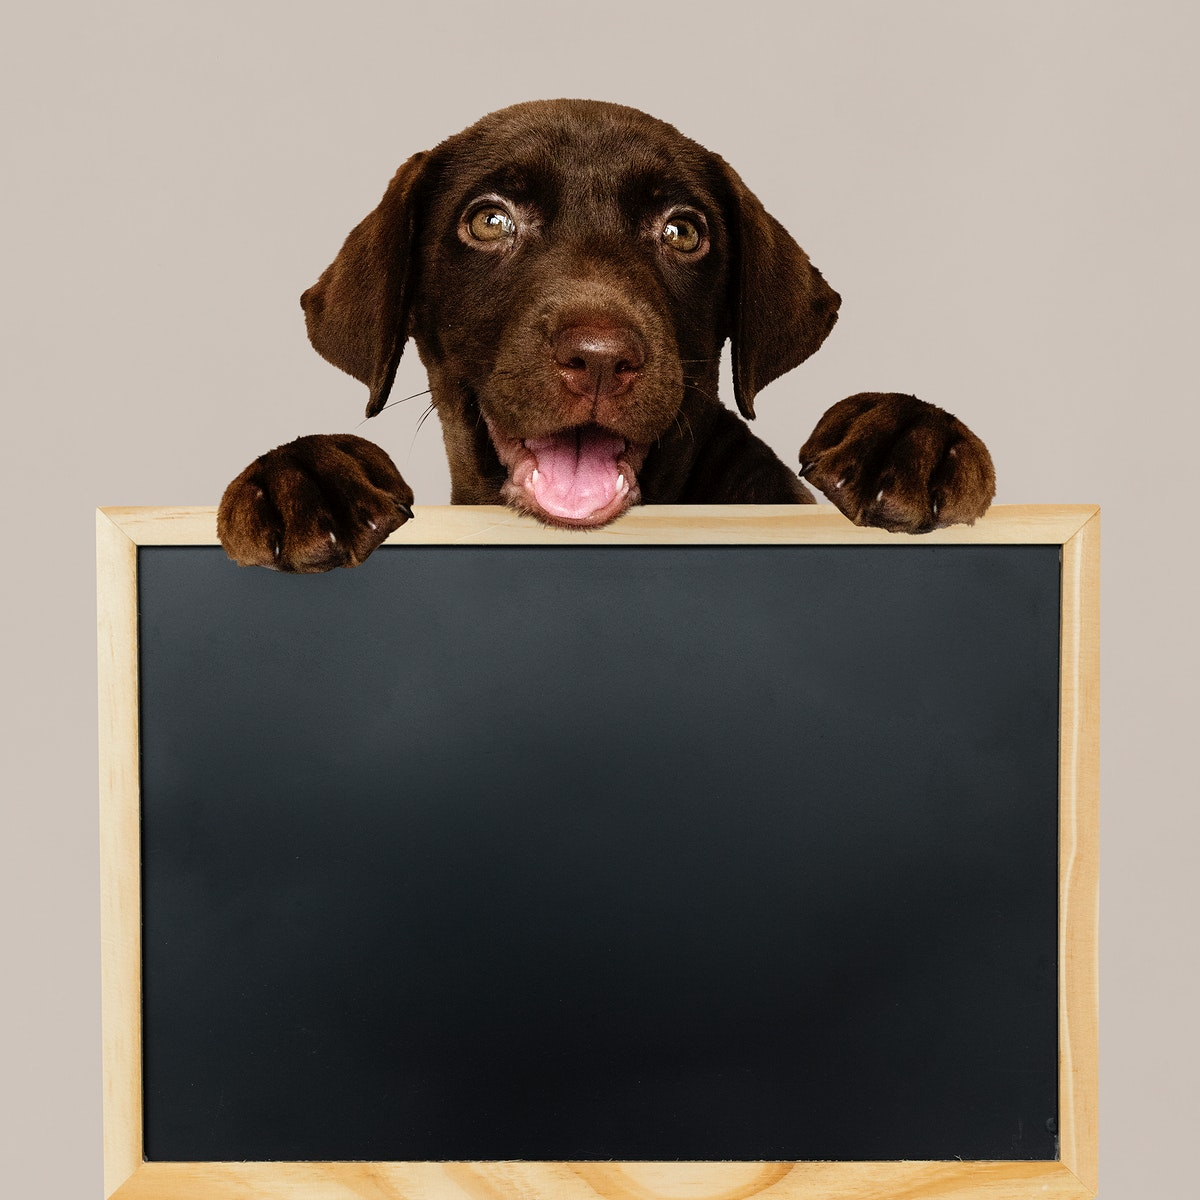 Adorable Labrador Retriever holding a blackboard mockup